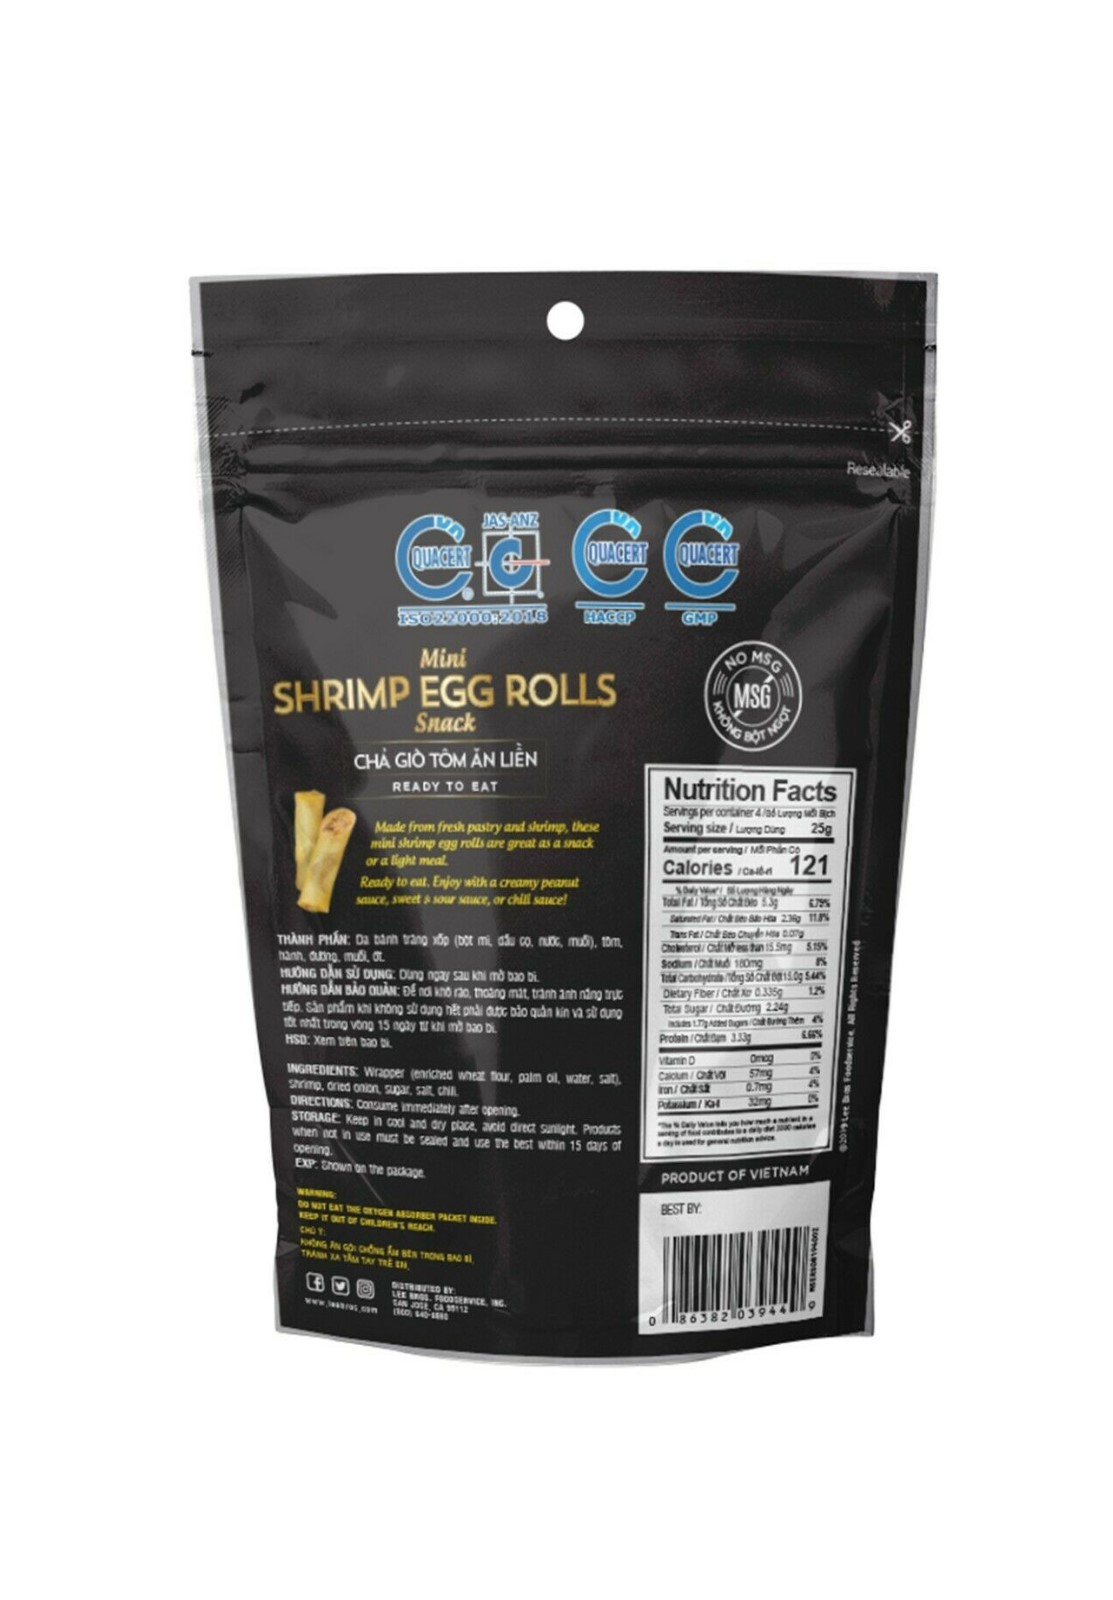 SAIGON GOURMET Mini Shrimp Egg Rolls Snack / Cha Gio Tom An Lien 4 OZ